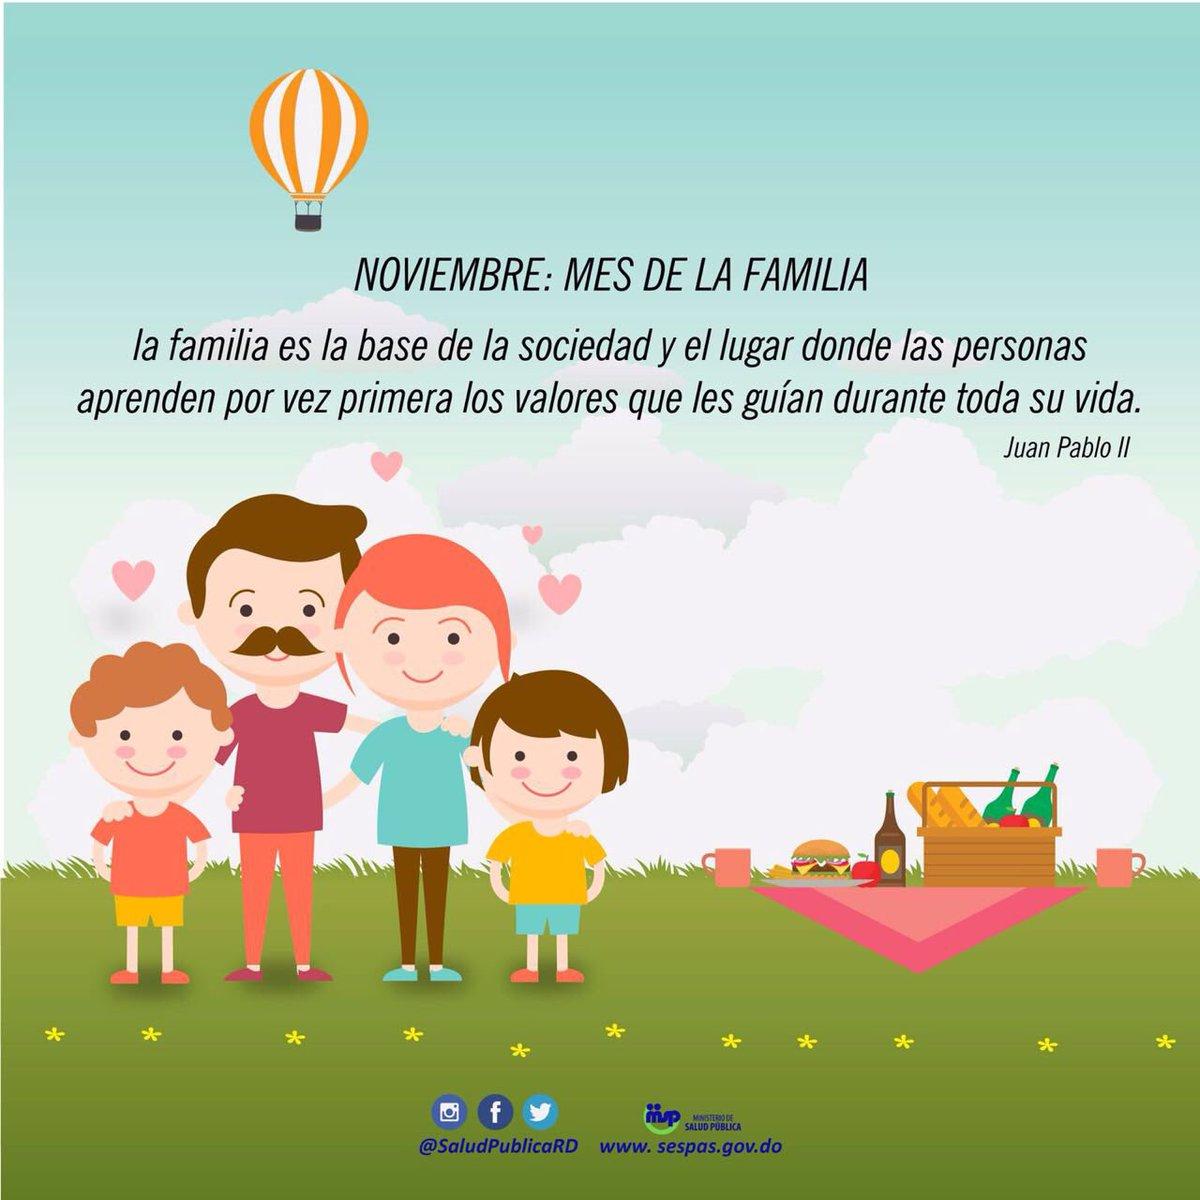 "Salud Pública RD Twitterissä: ""Noviembre: Mes de la familia. ""La familia es  la base de la sociedad"". #JuanPabloII #saludpublicard… """